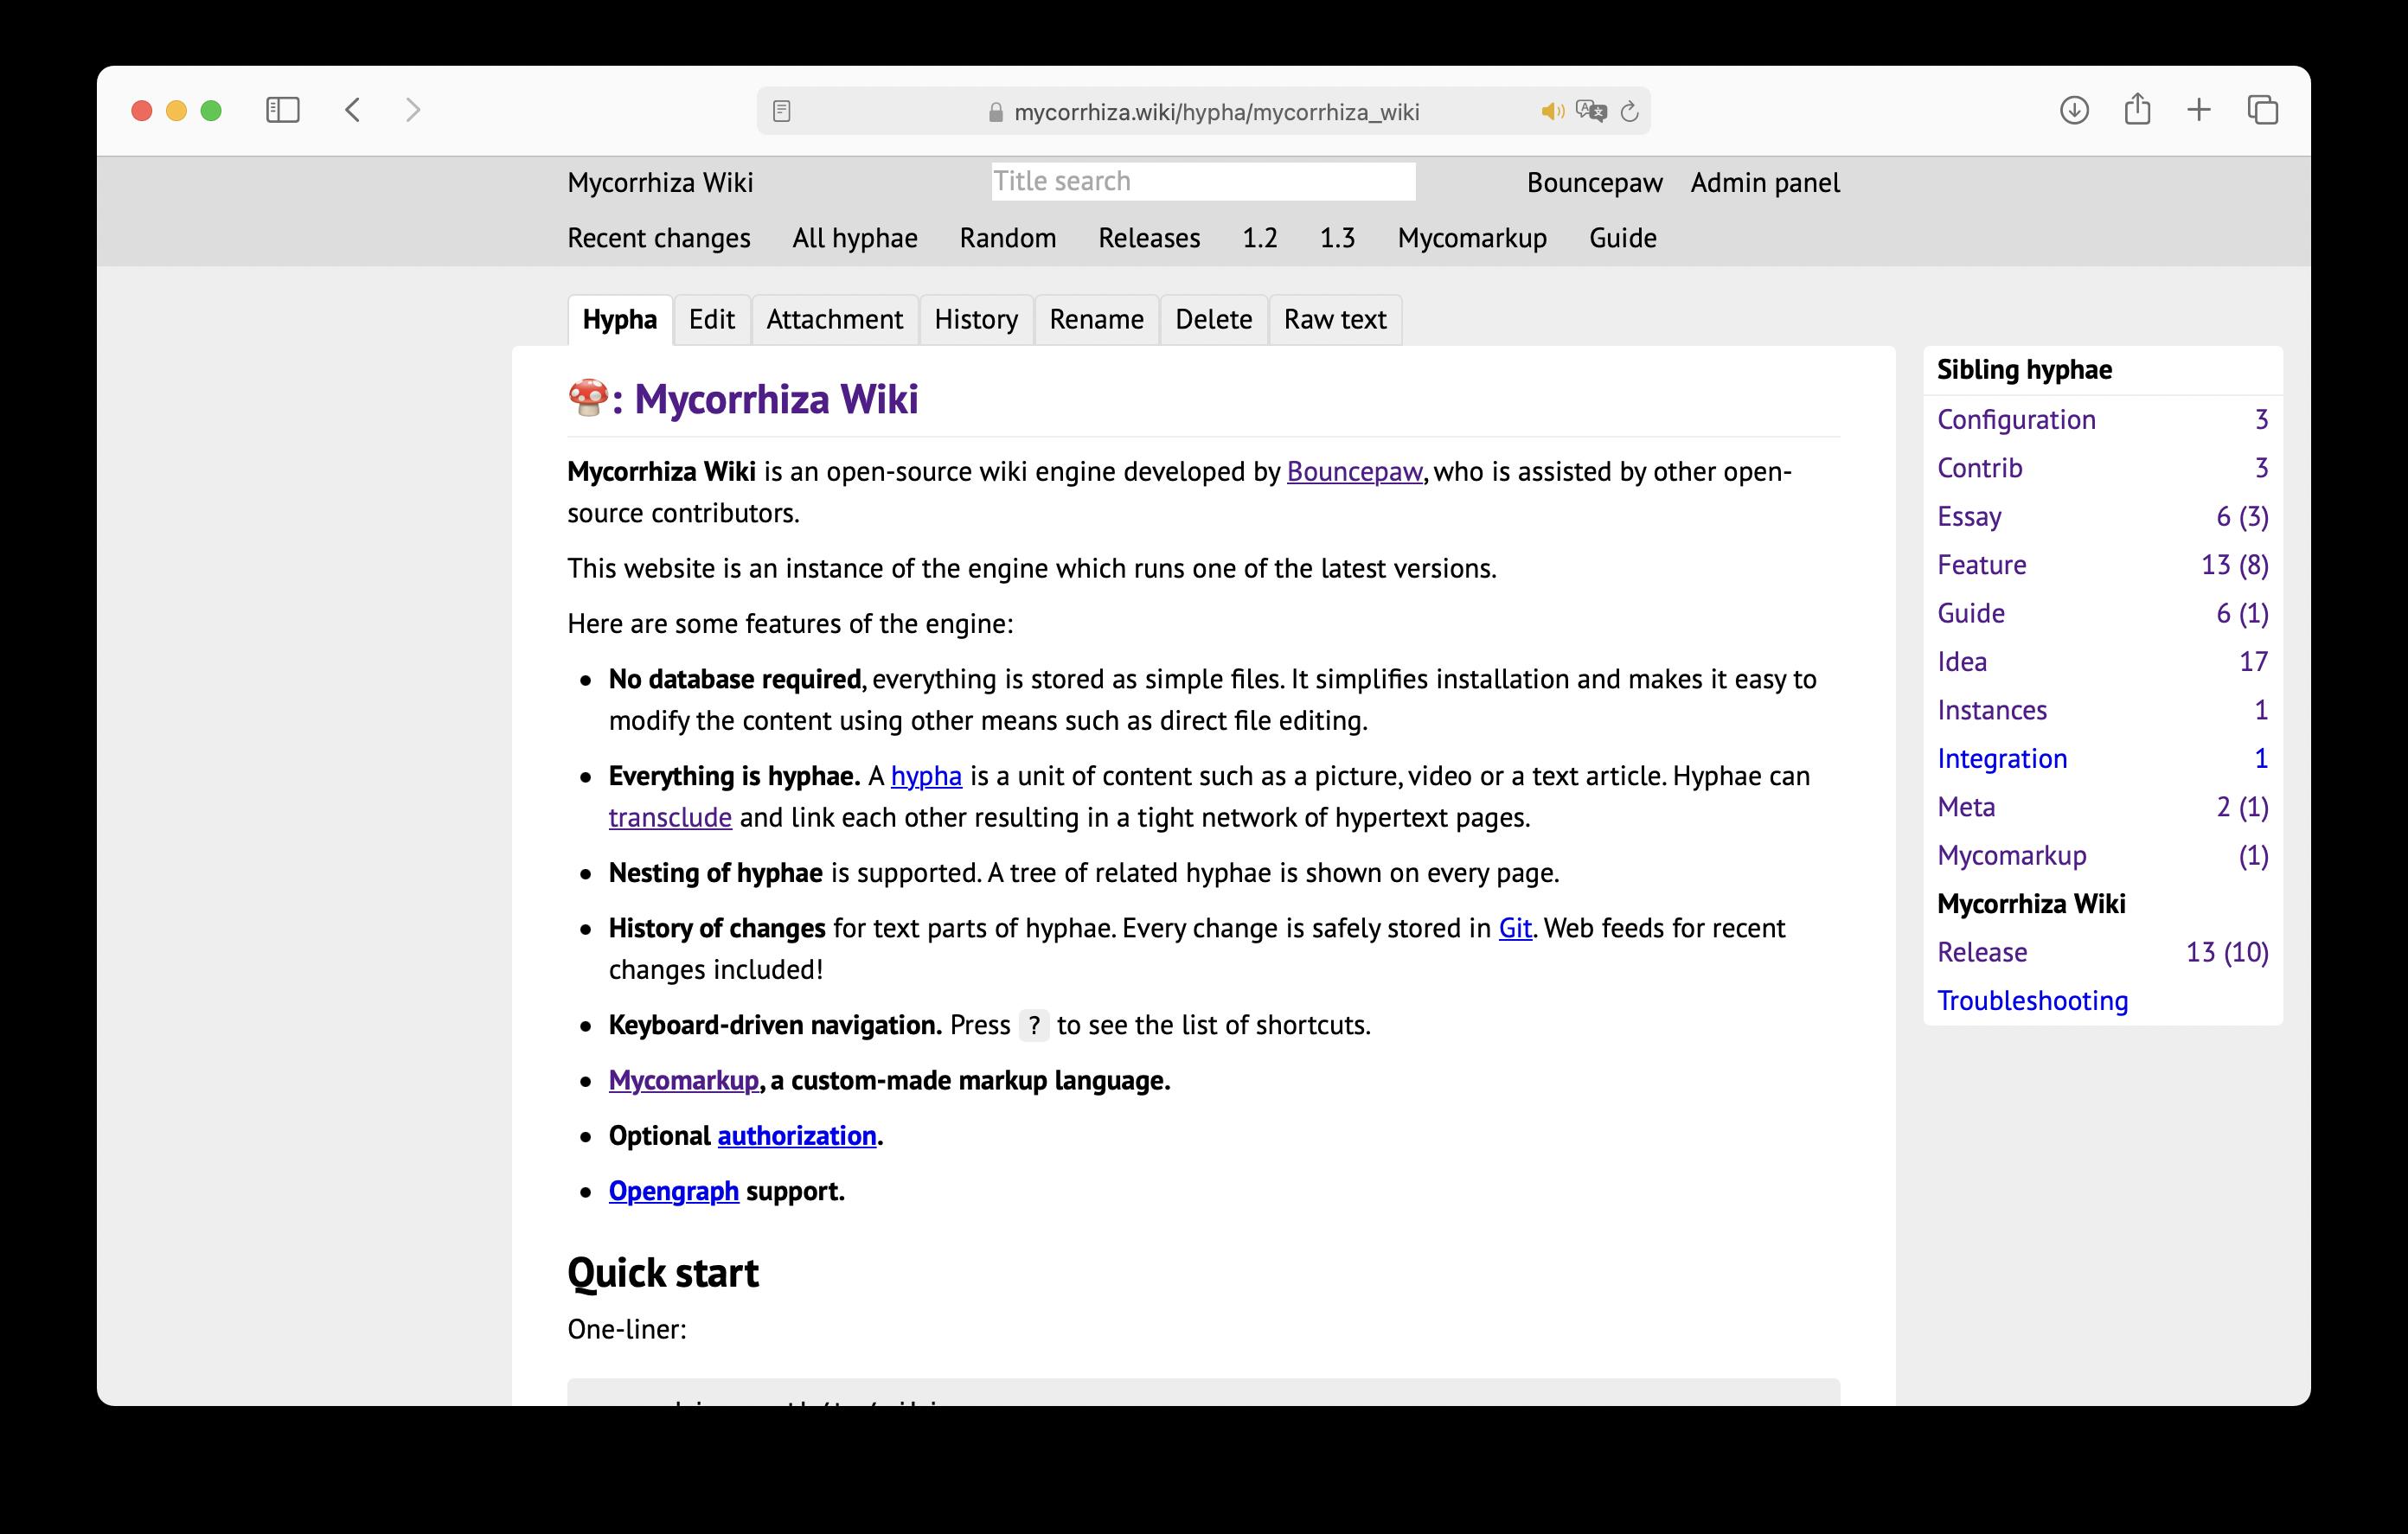 A screenshot of mycorrhiza.wiki's home page in the Safari browser